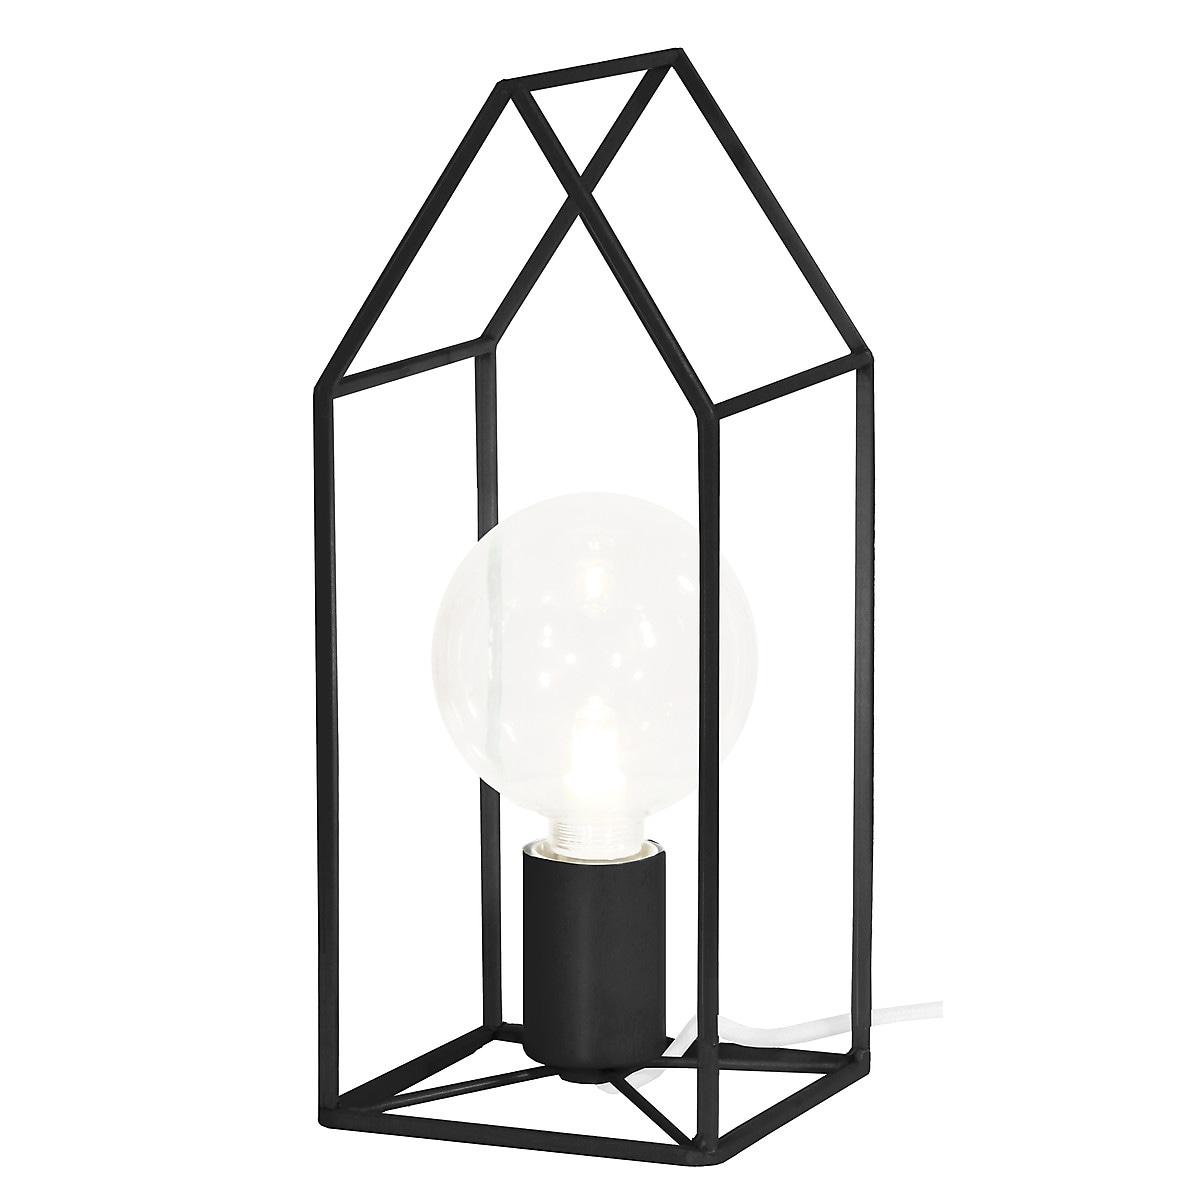 Pöytävalaisin Home Globen Lighting